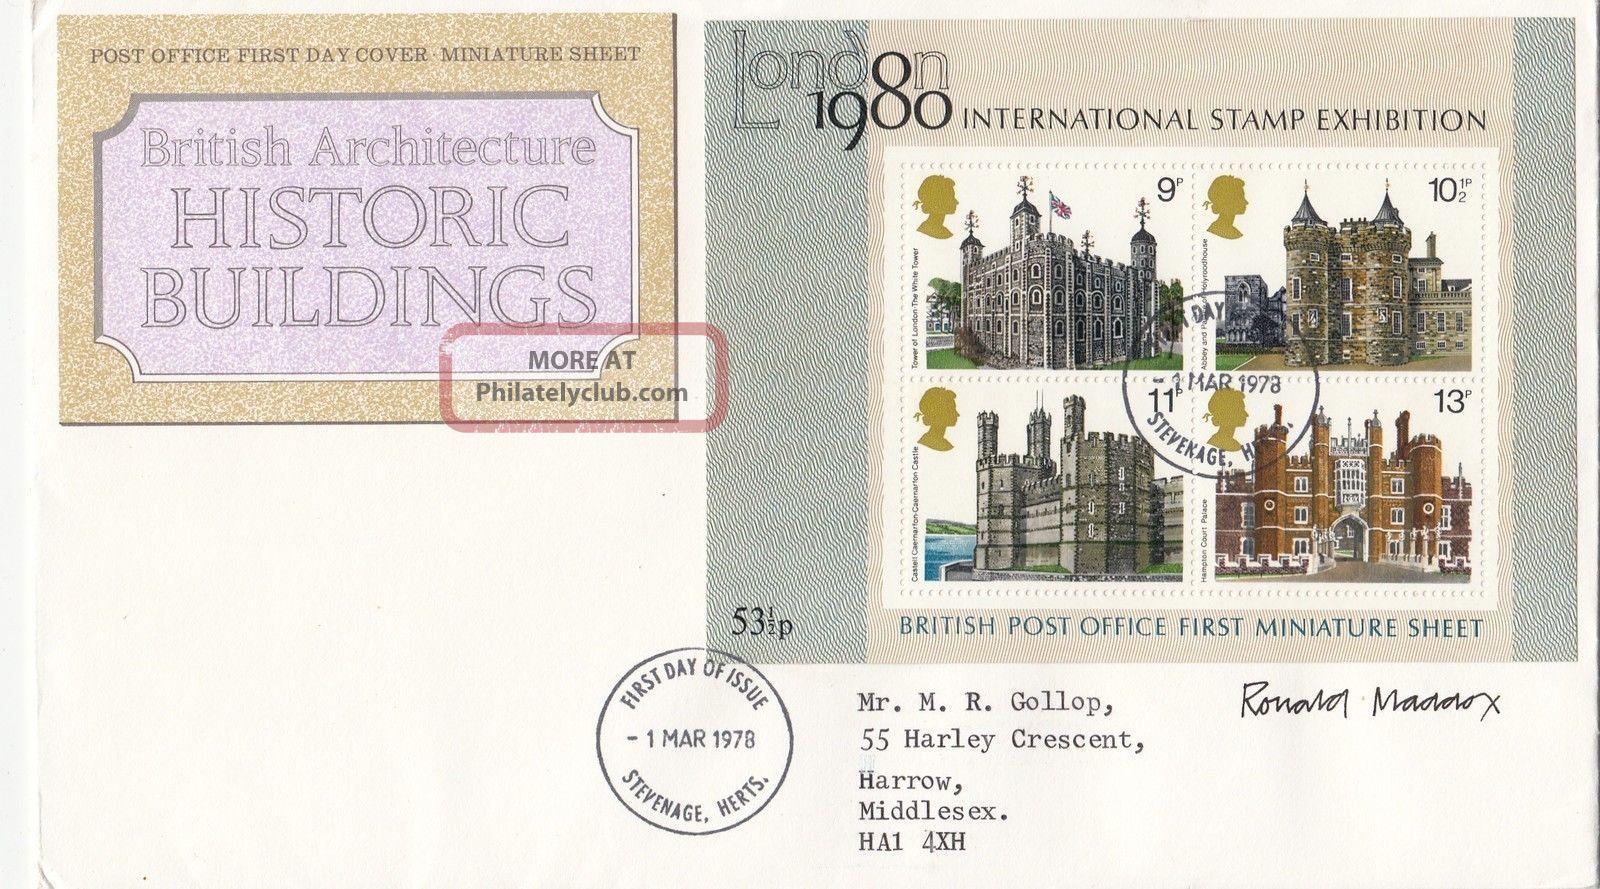 (28805) Gb Fdc Designer Signed Histroric Building Minisheet Stevenage 1 Mar 1978 1971-Now photo